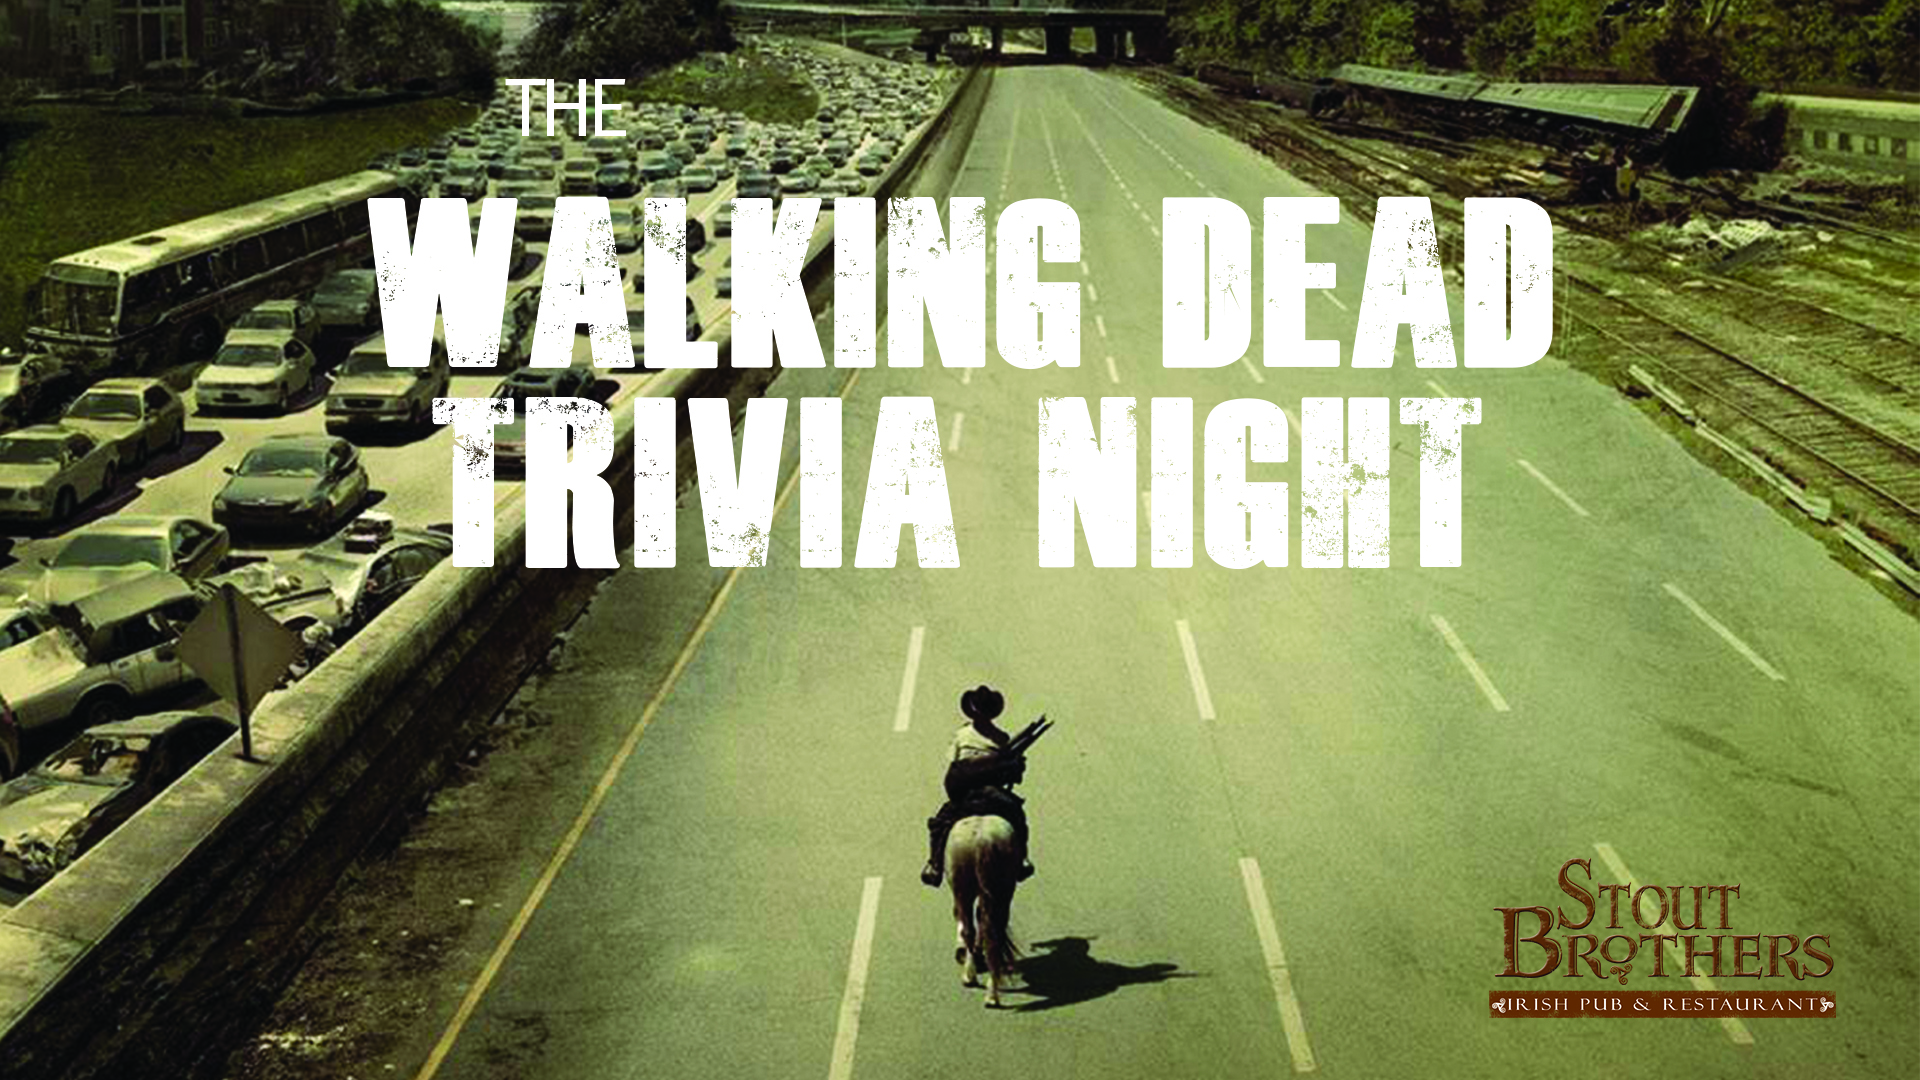 Walking Dead Eventbrite.jpg